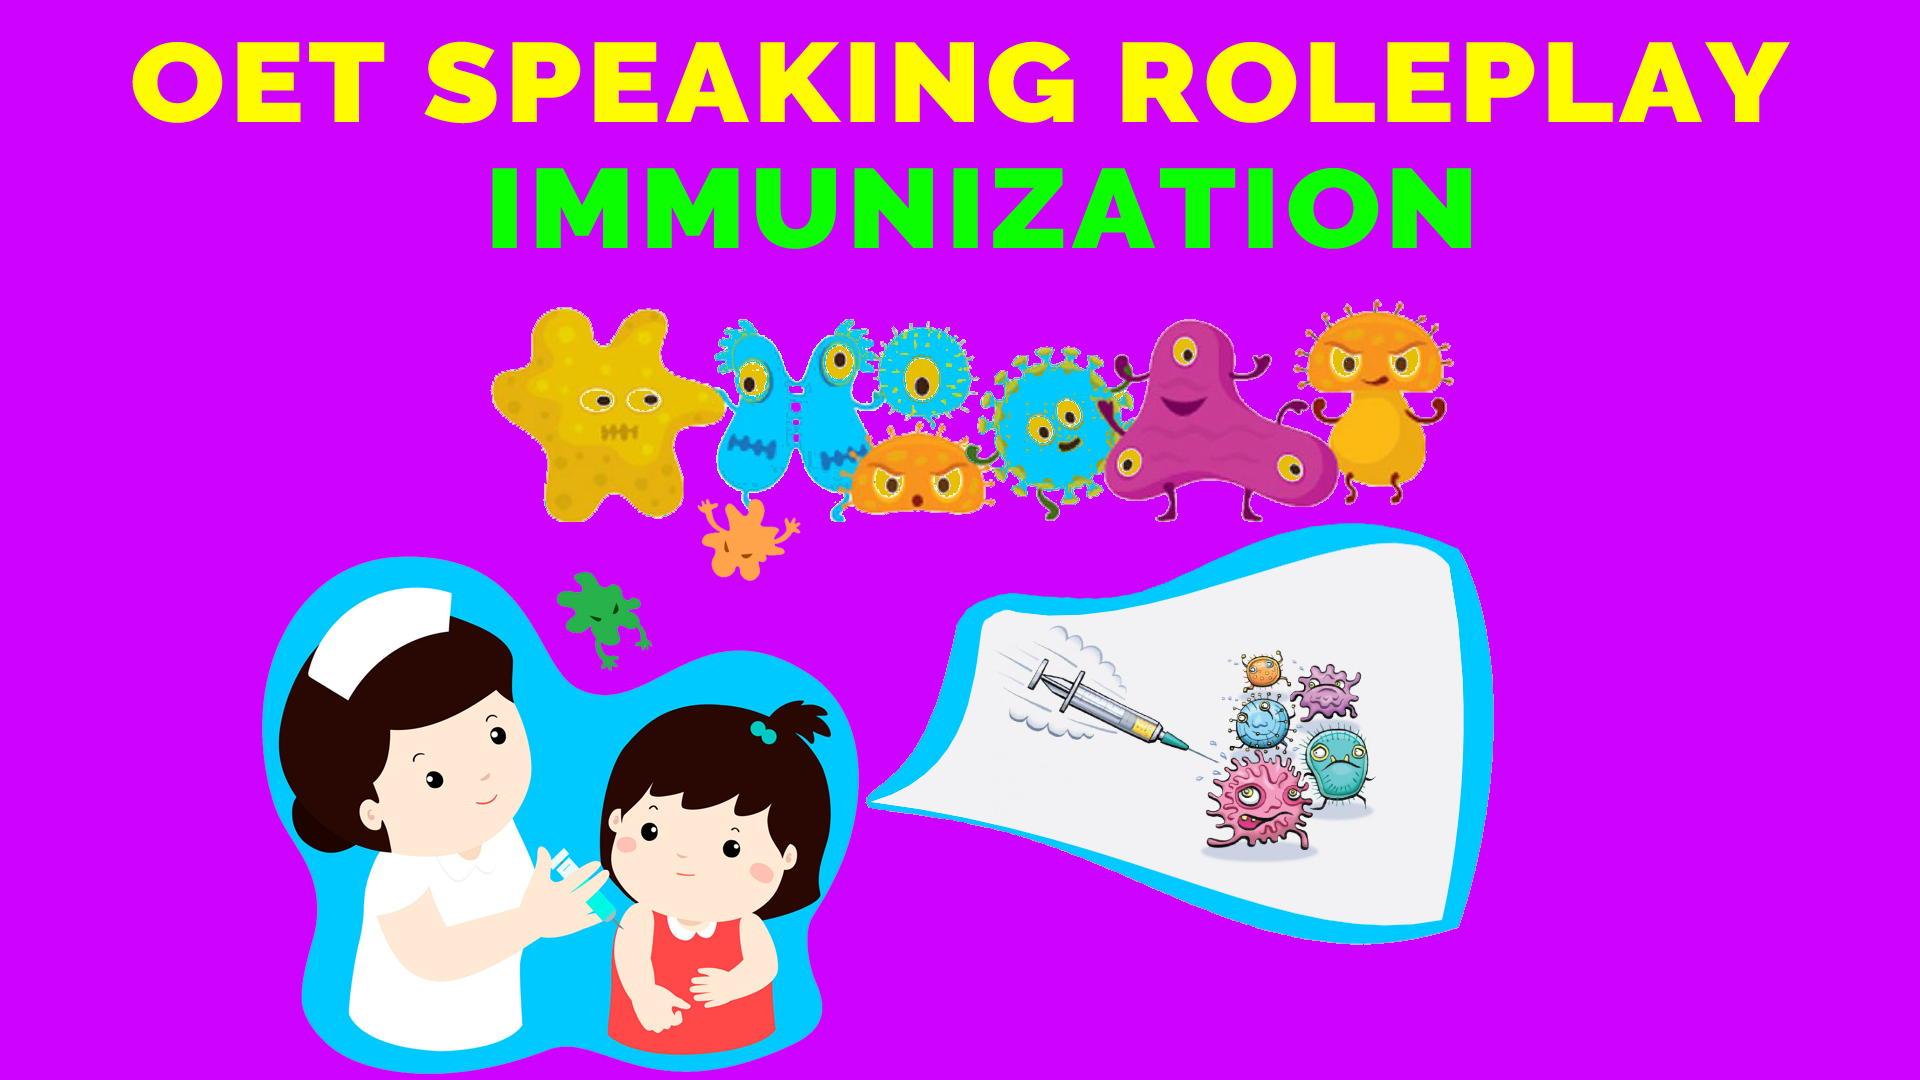 OET SPEAKING ROLE PLAY - IMMUNIZATION